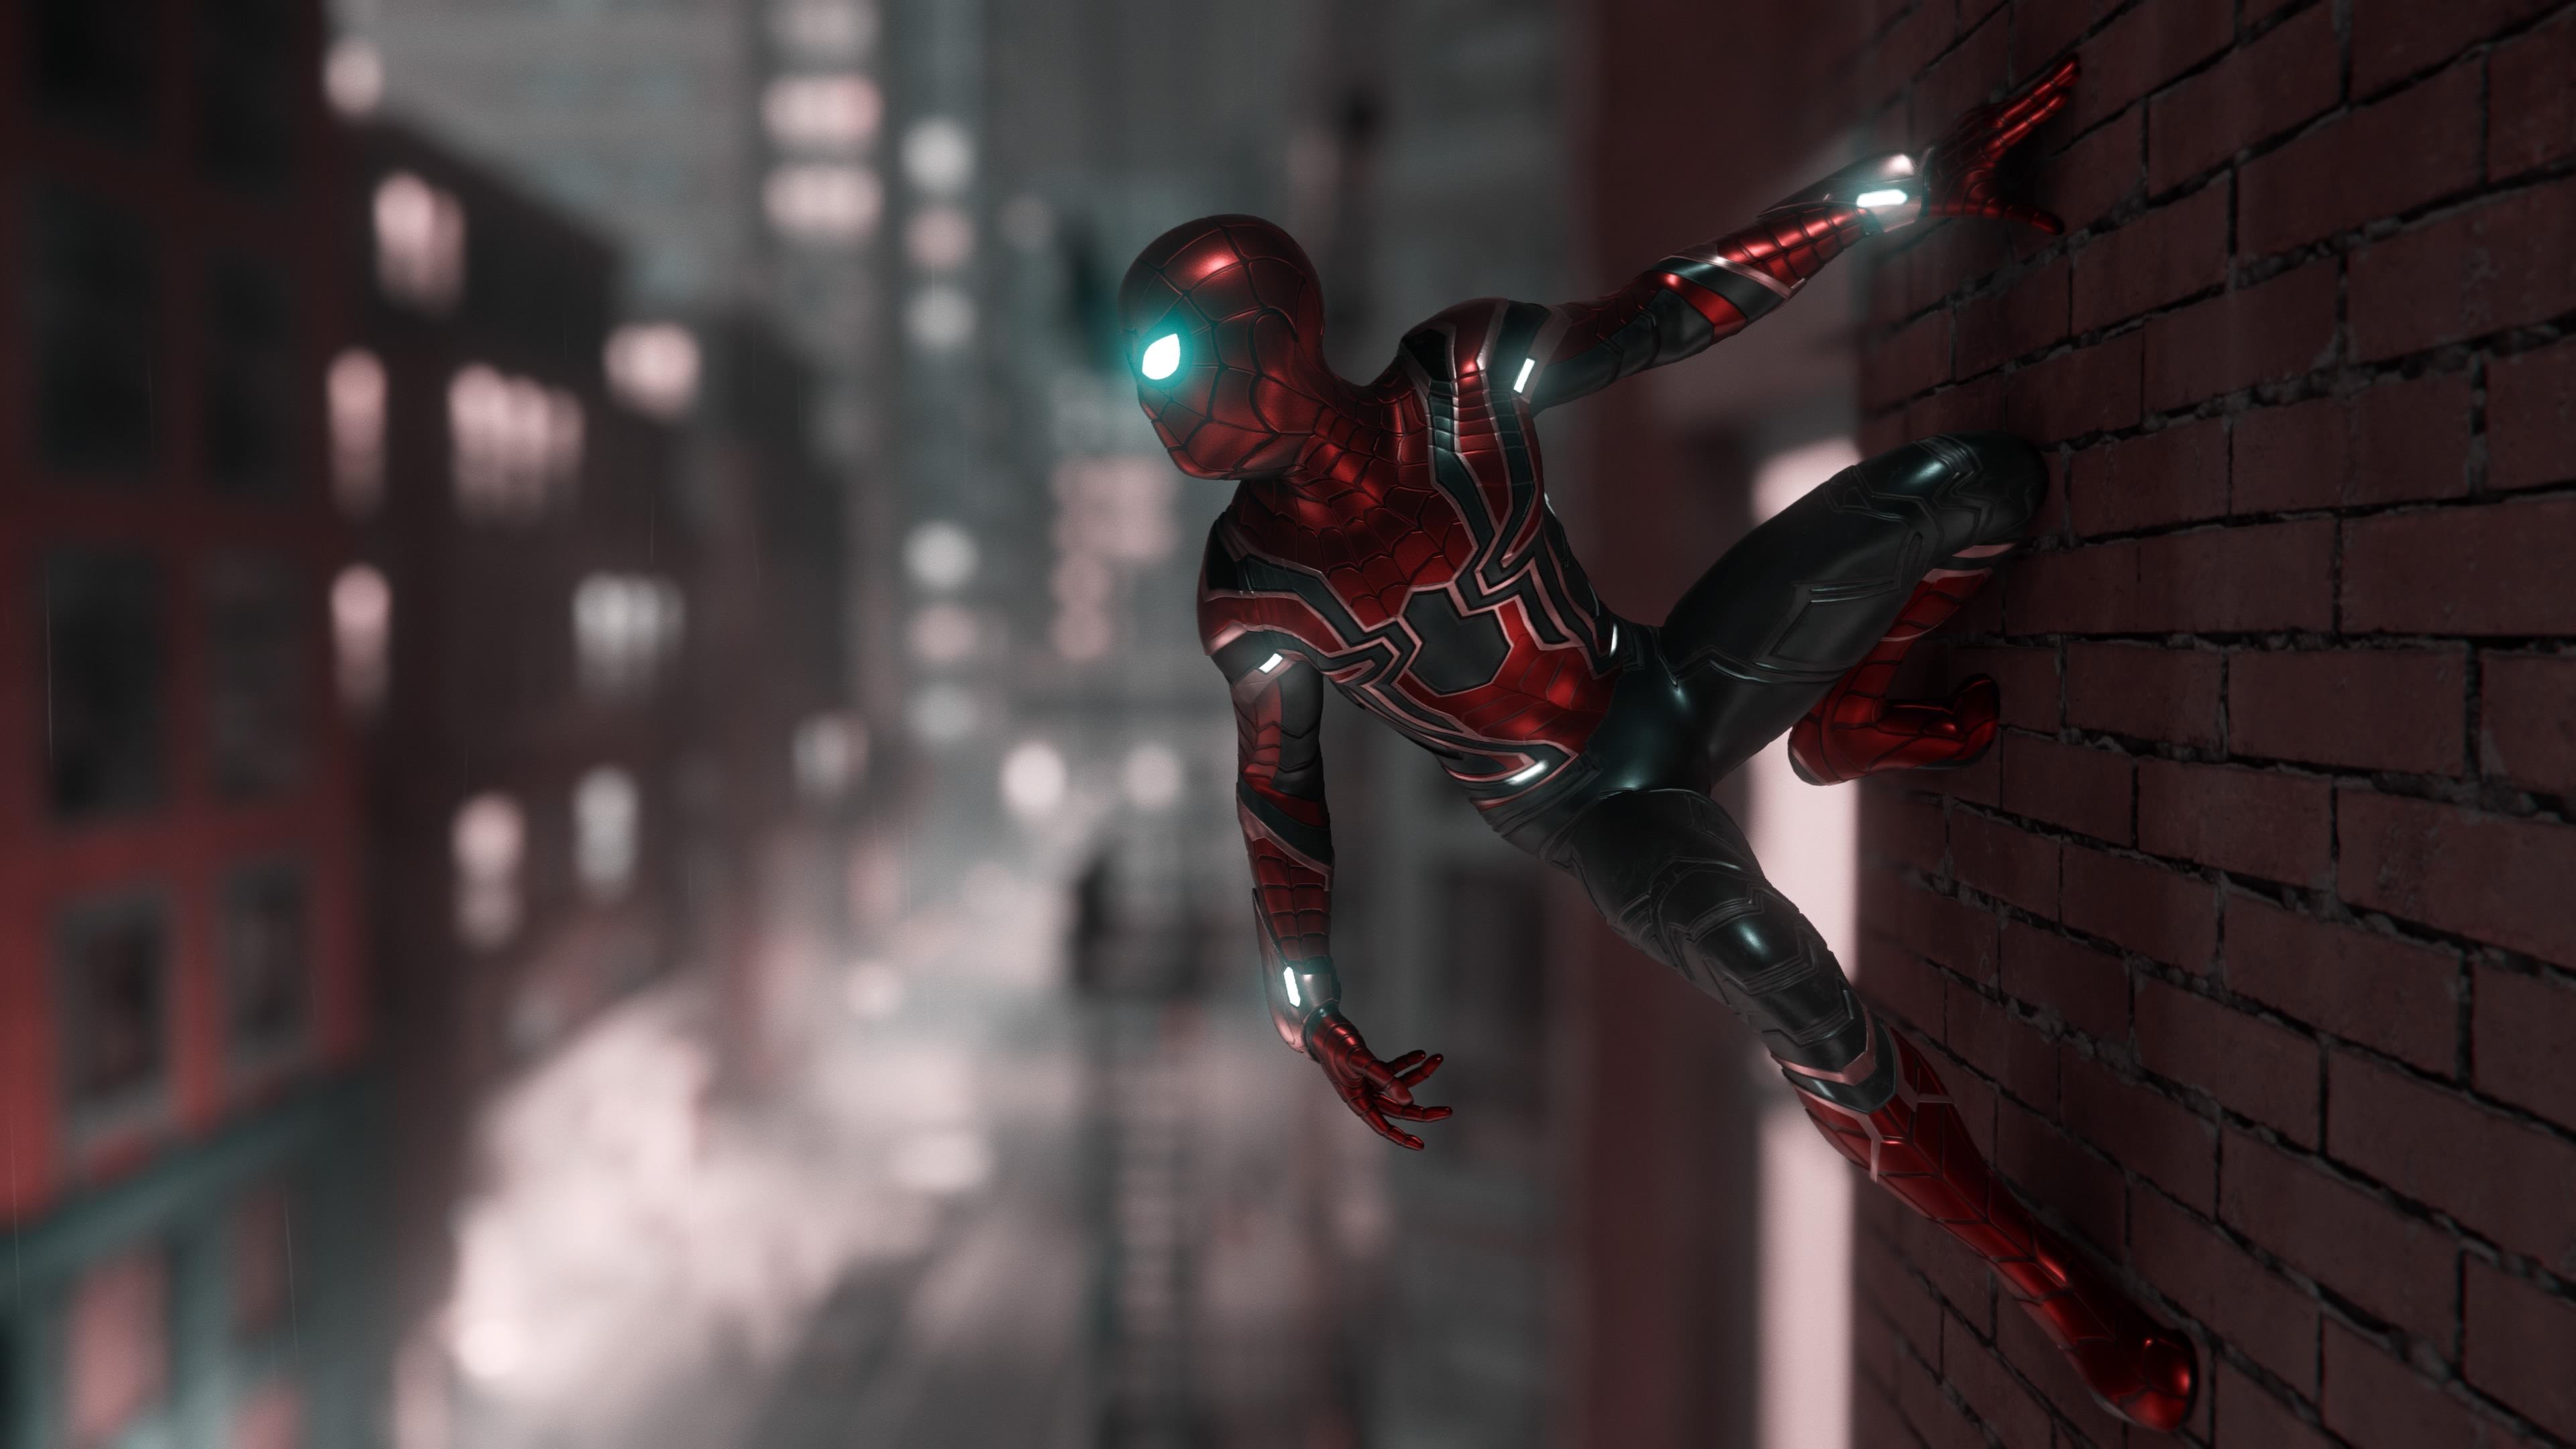 Marvel Spiderman Ps4 4k, HD Games, 4k Wallpapers, Images ...